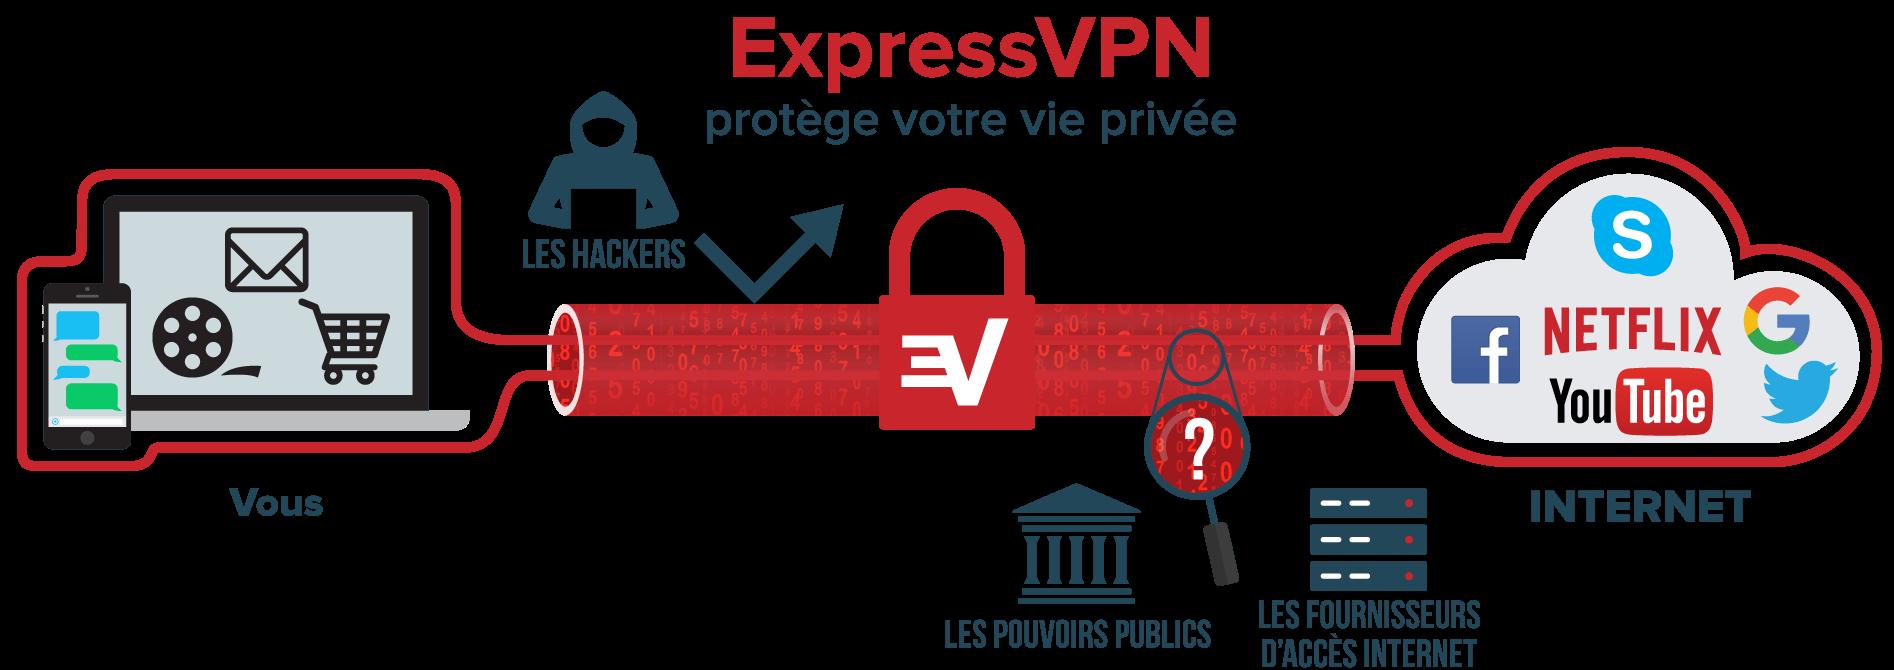 etre anonyme avec expressVPN